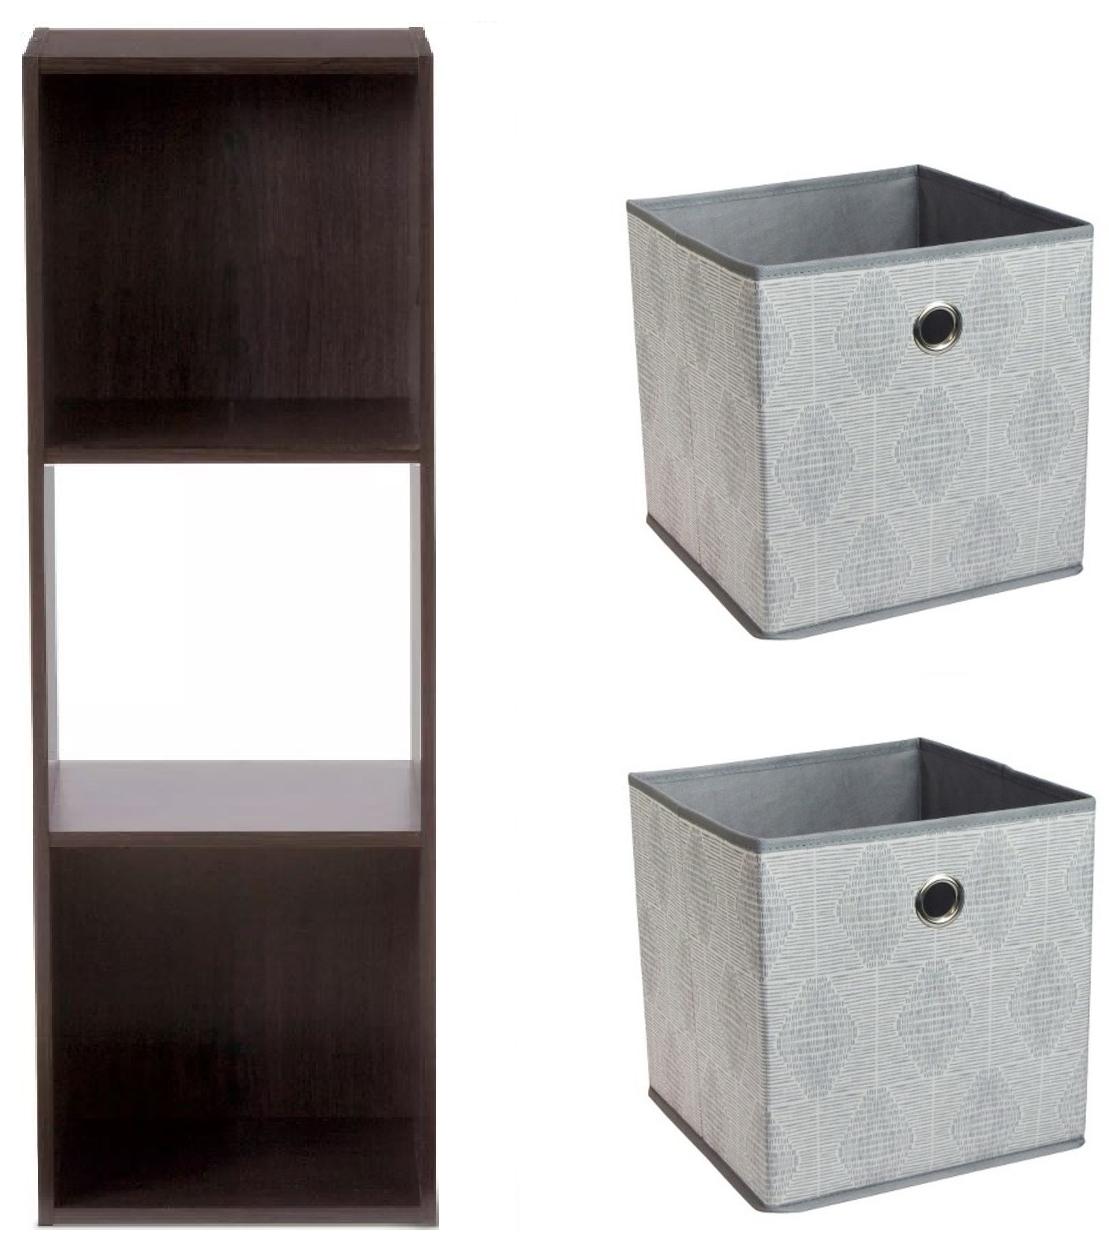 Room Essentials 3-Cube Organizer Shelf + 2-Ct Cube Storage